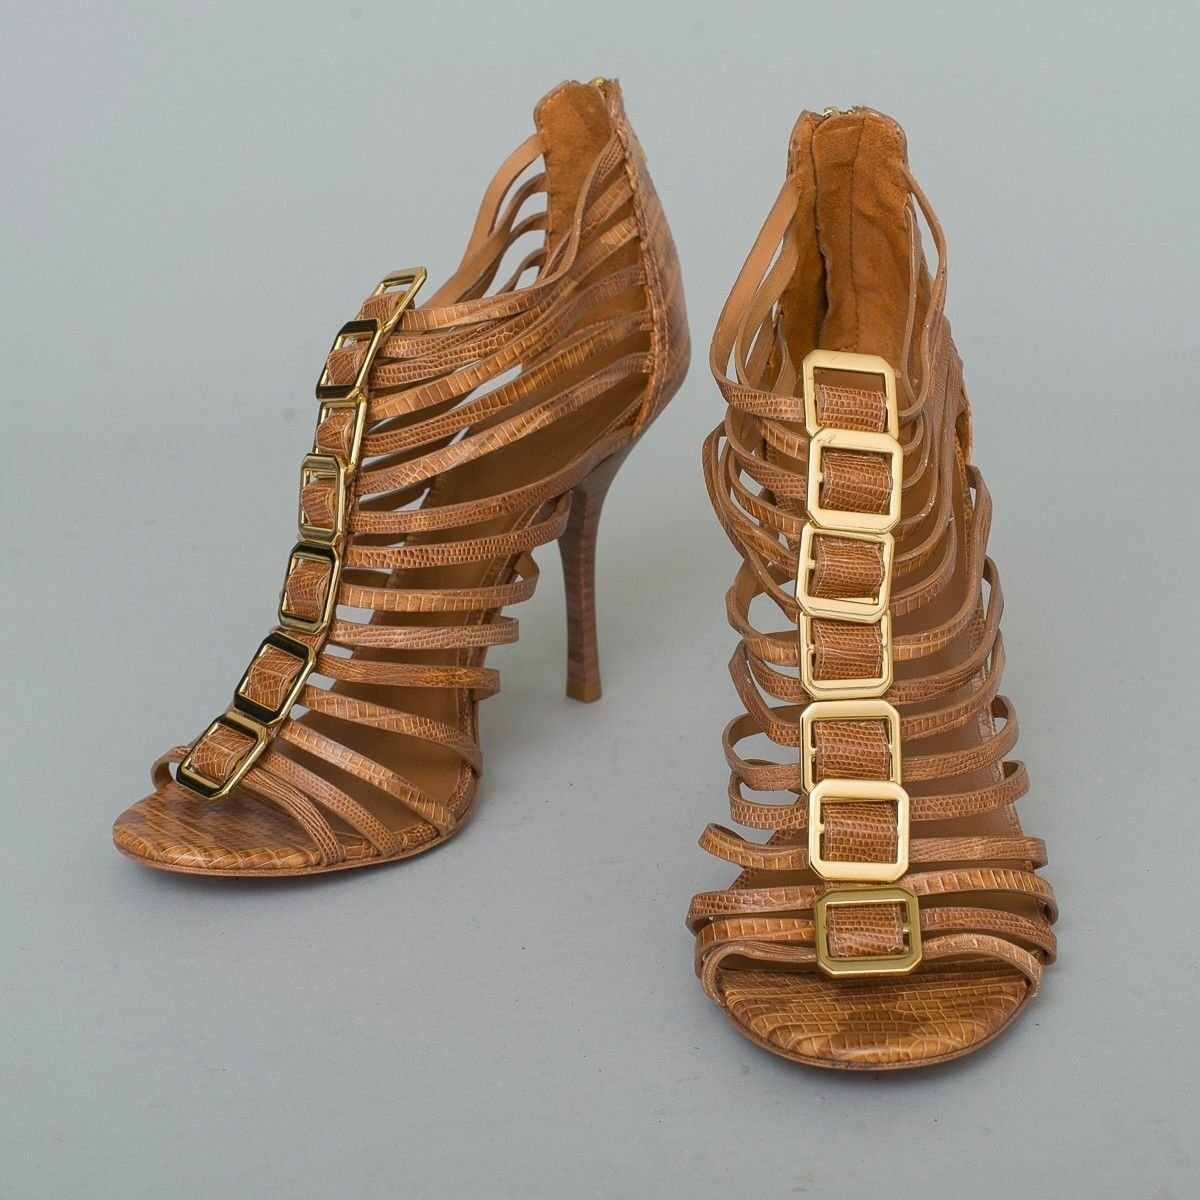 NEW! Tory Burch Designer Brown Pelle 'Snakeskin' Strappy High Heels Size 10